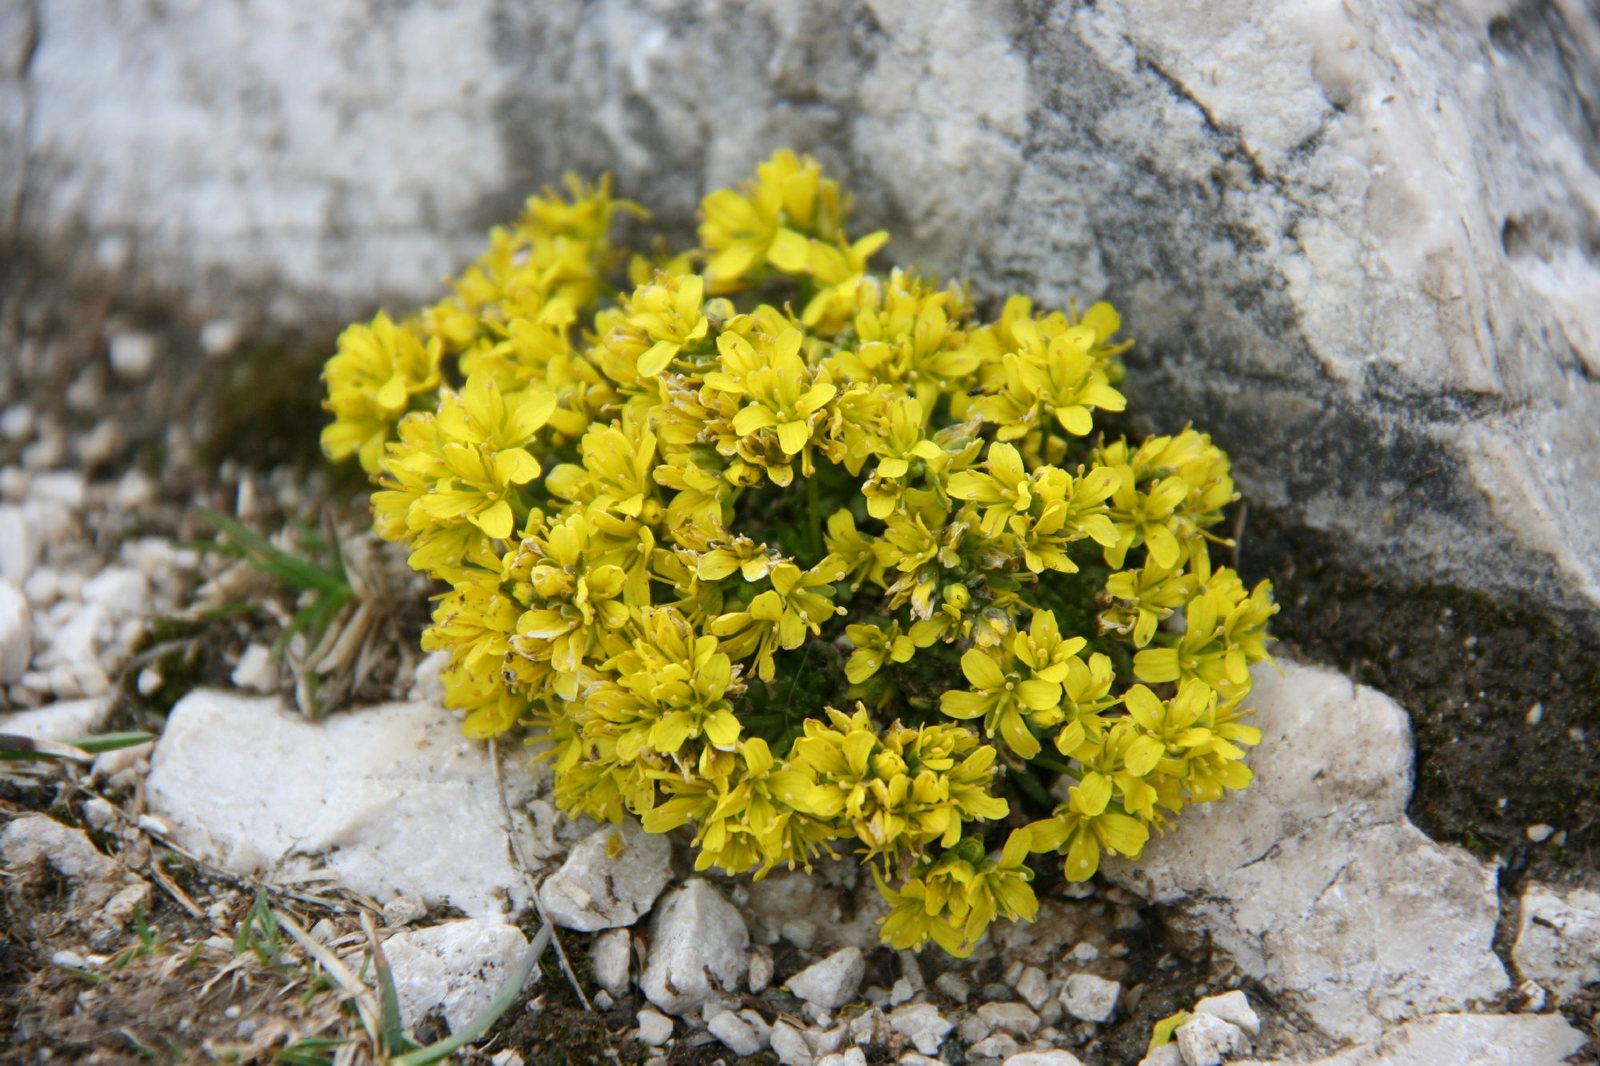 15 Draba aizoides Seeds, Alpine Draba, Alpine Whitlow grass Seeds - $8.00